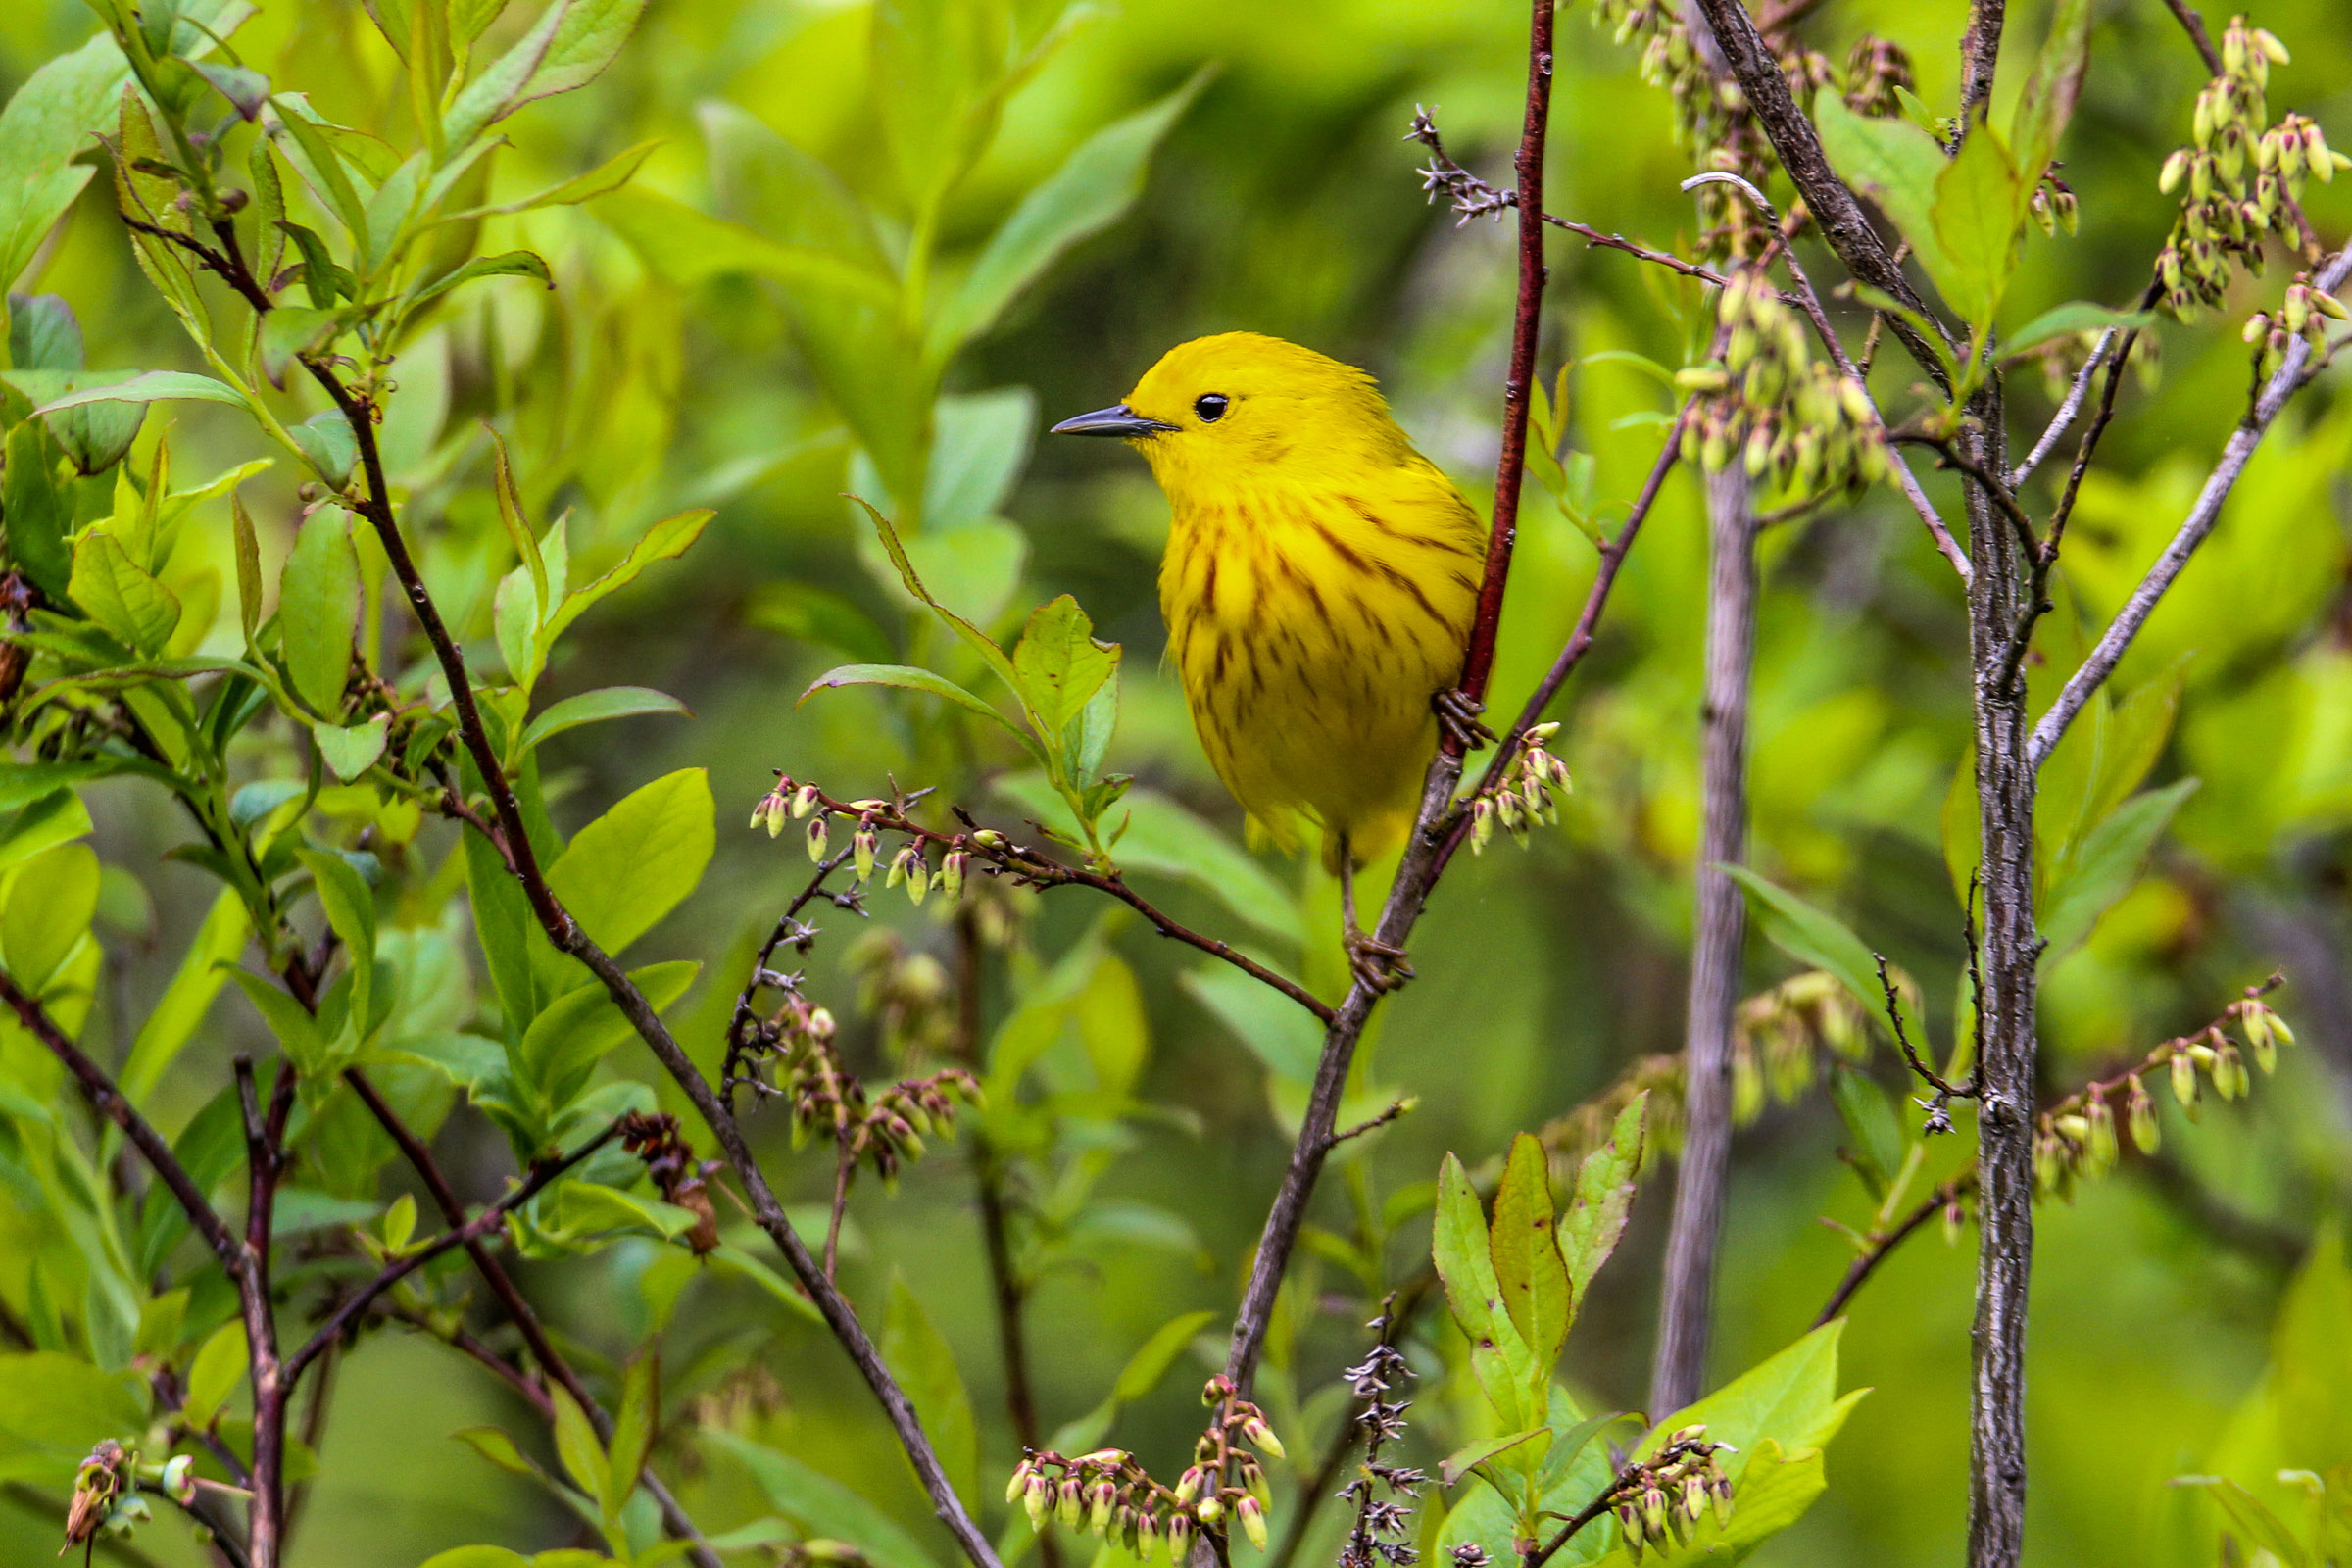 Yellow Warbler. Todd Phillippi/Audubon Photography Awards